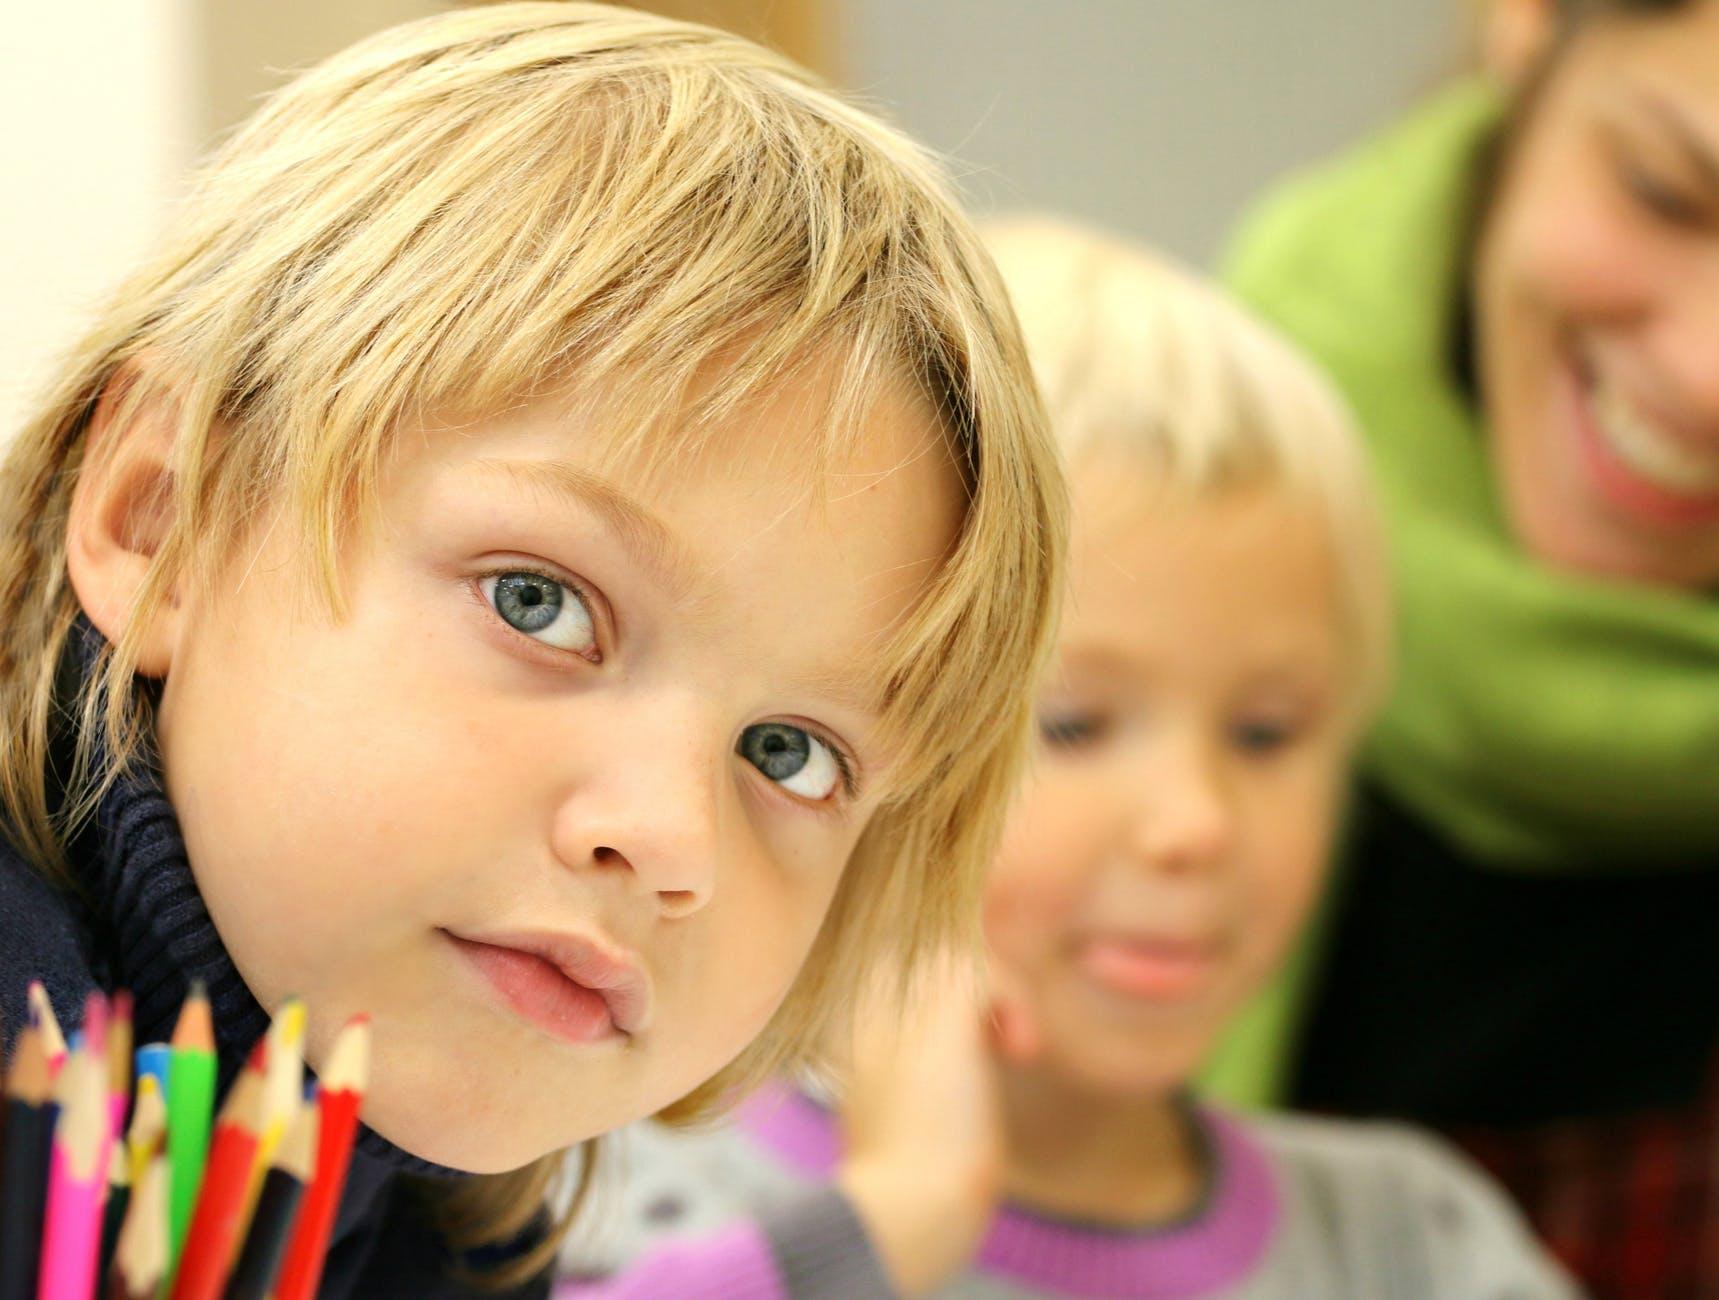 boy child childhood class